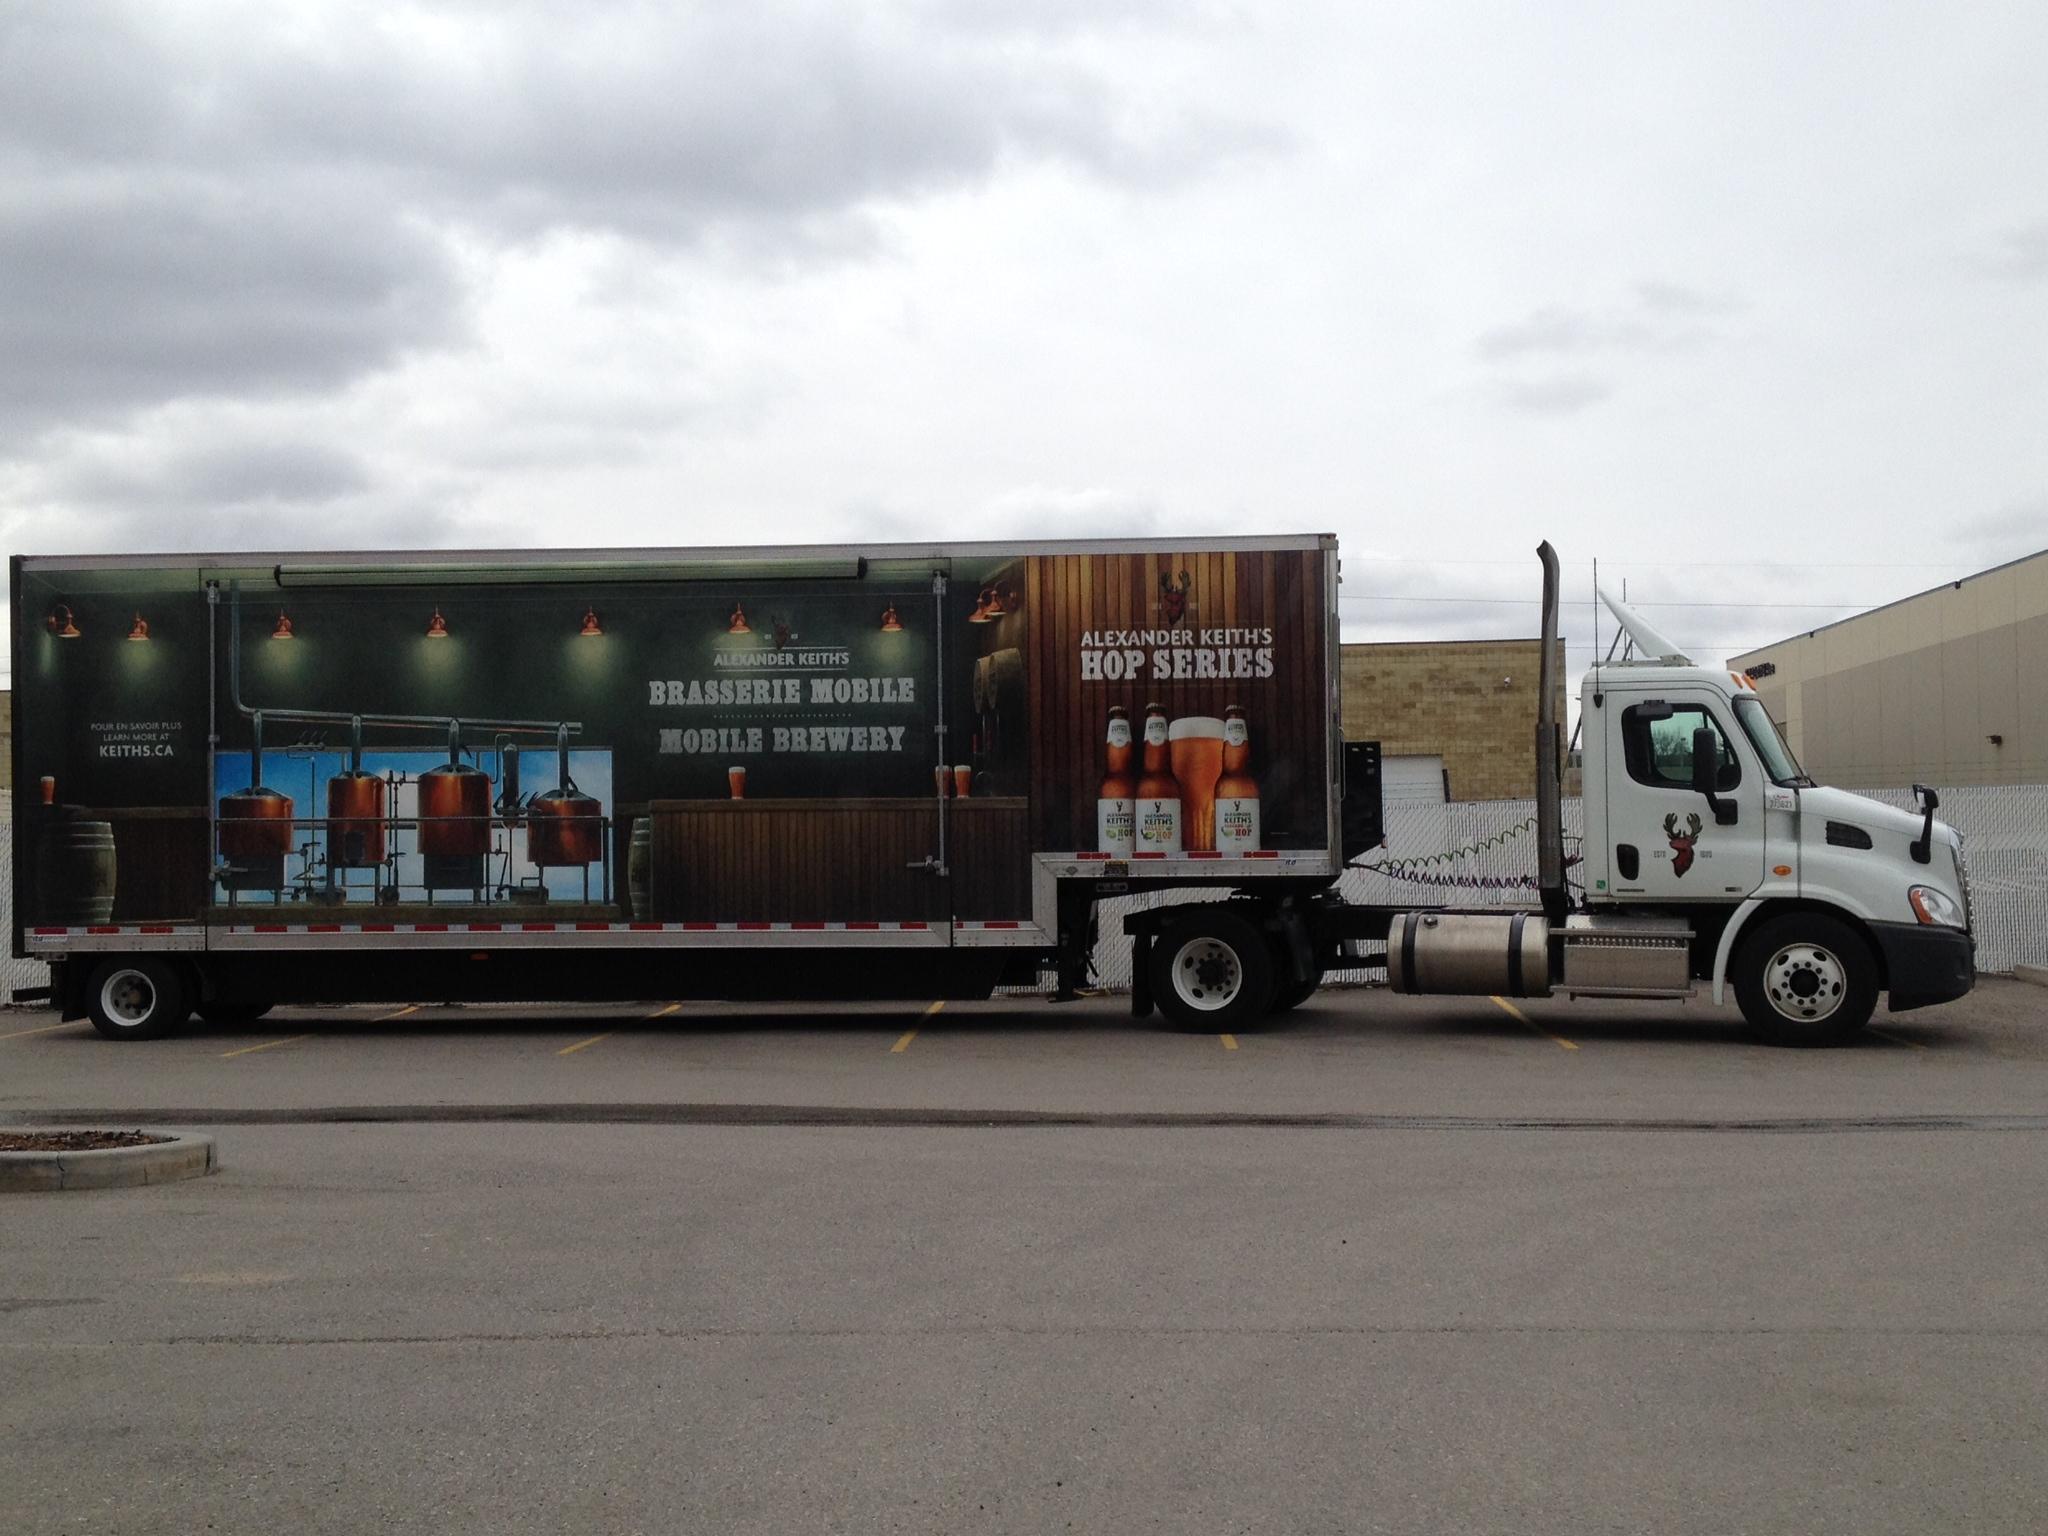 Truck trailer wrap - Alexander Keith's